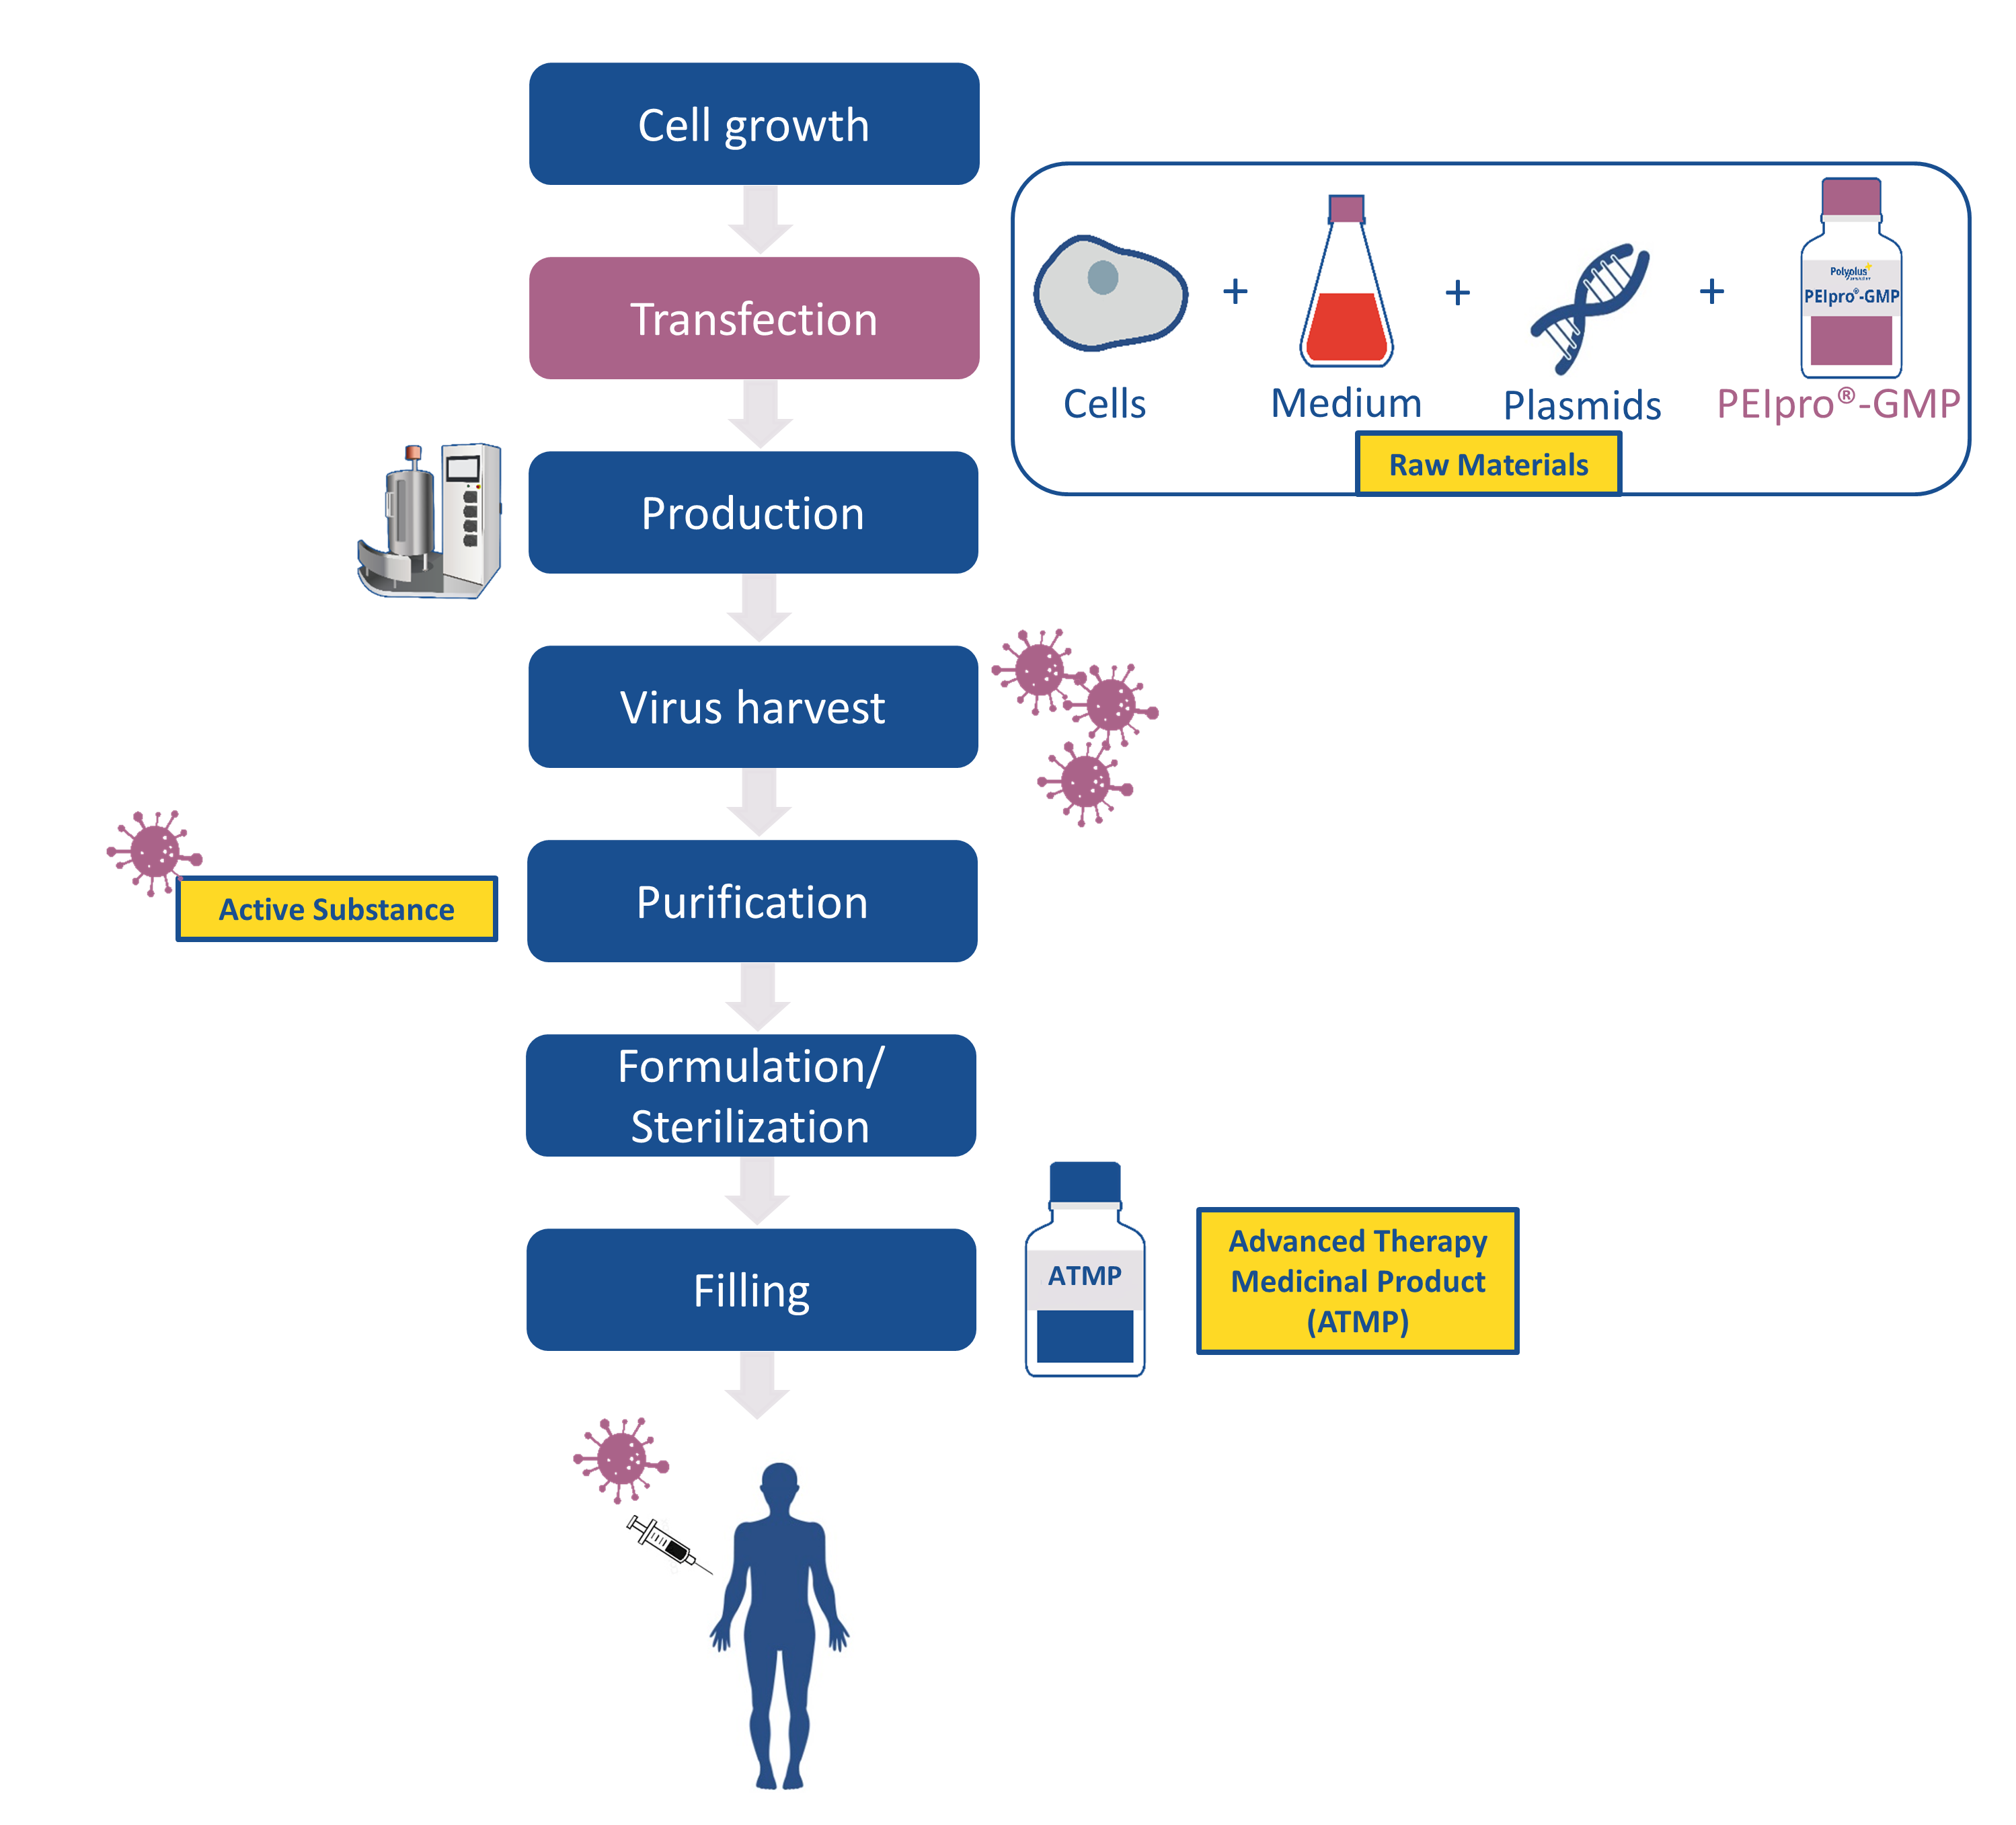 PEIpro residual test steps